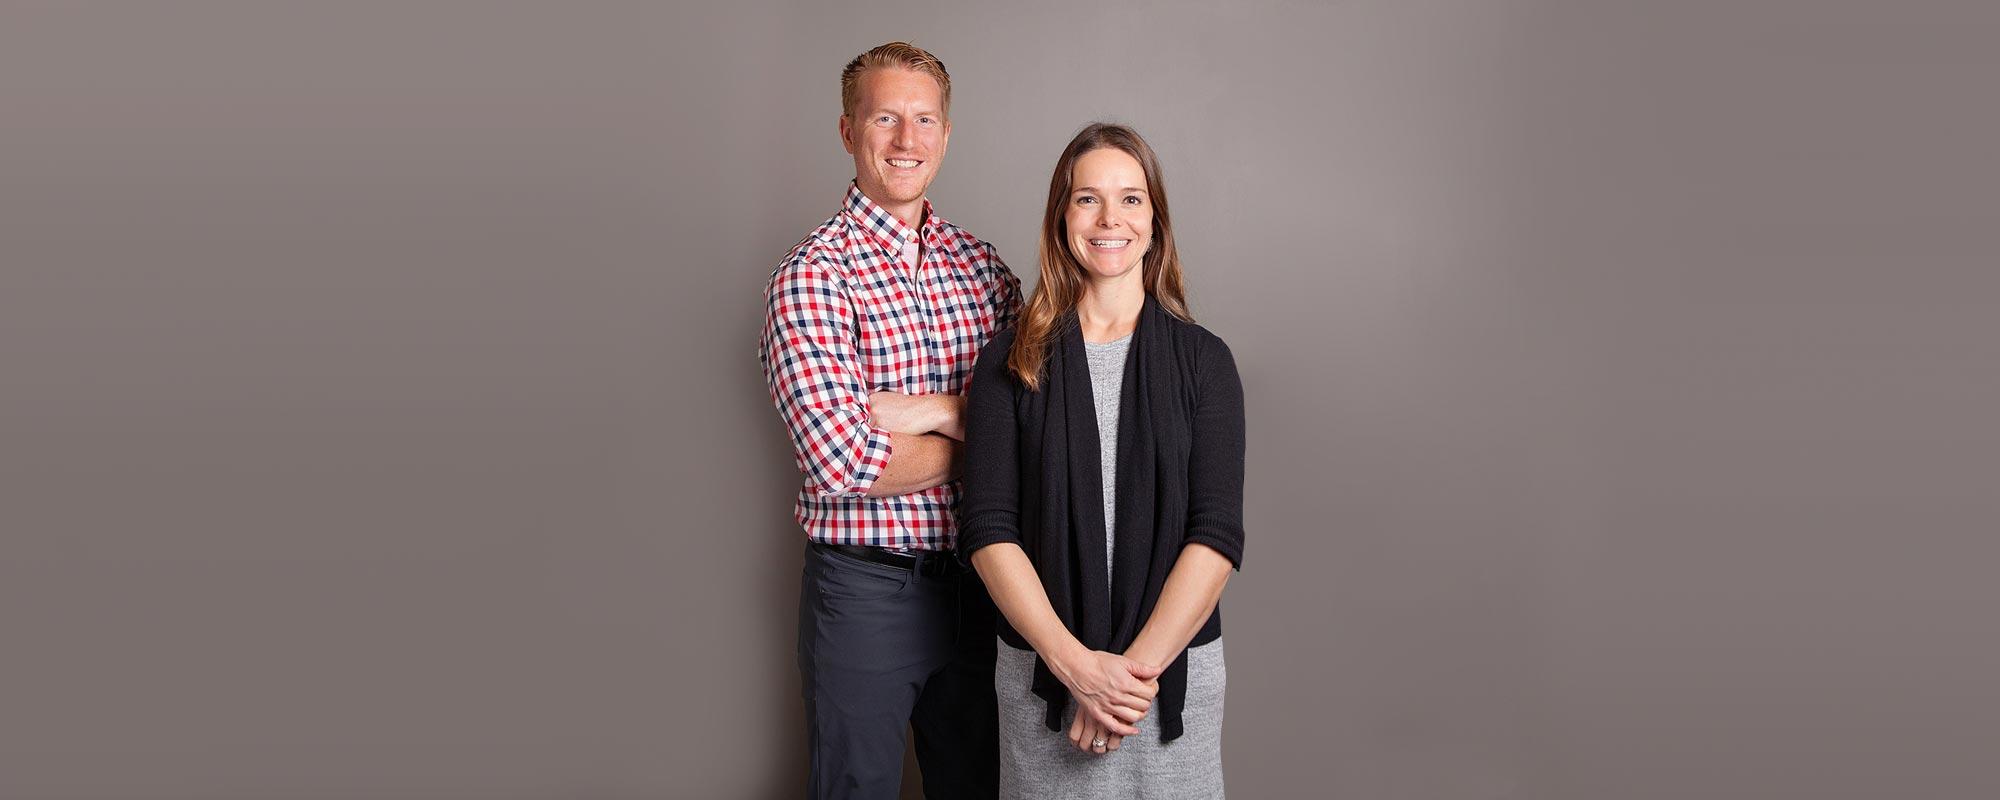 Chiropractor Brighton MI Kyle Conn and Melissa Osborn